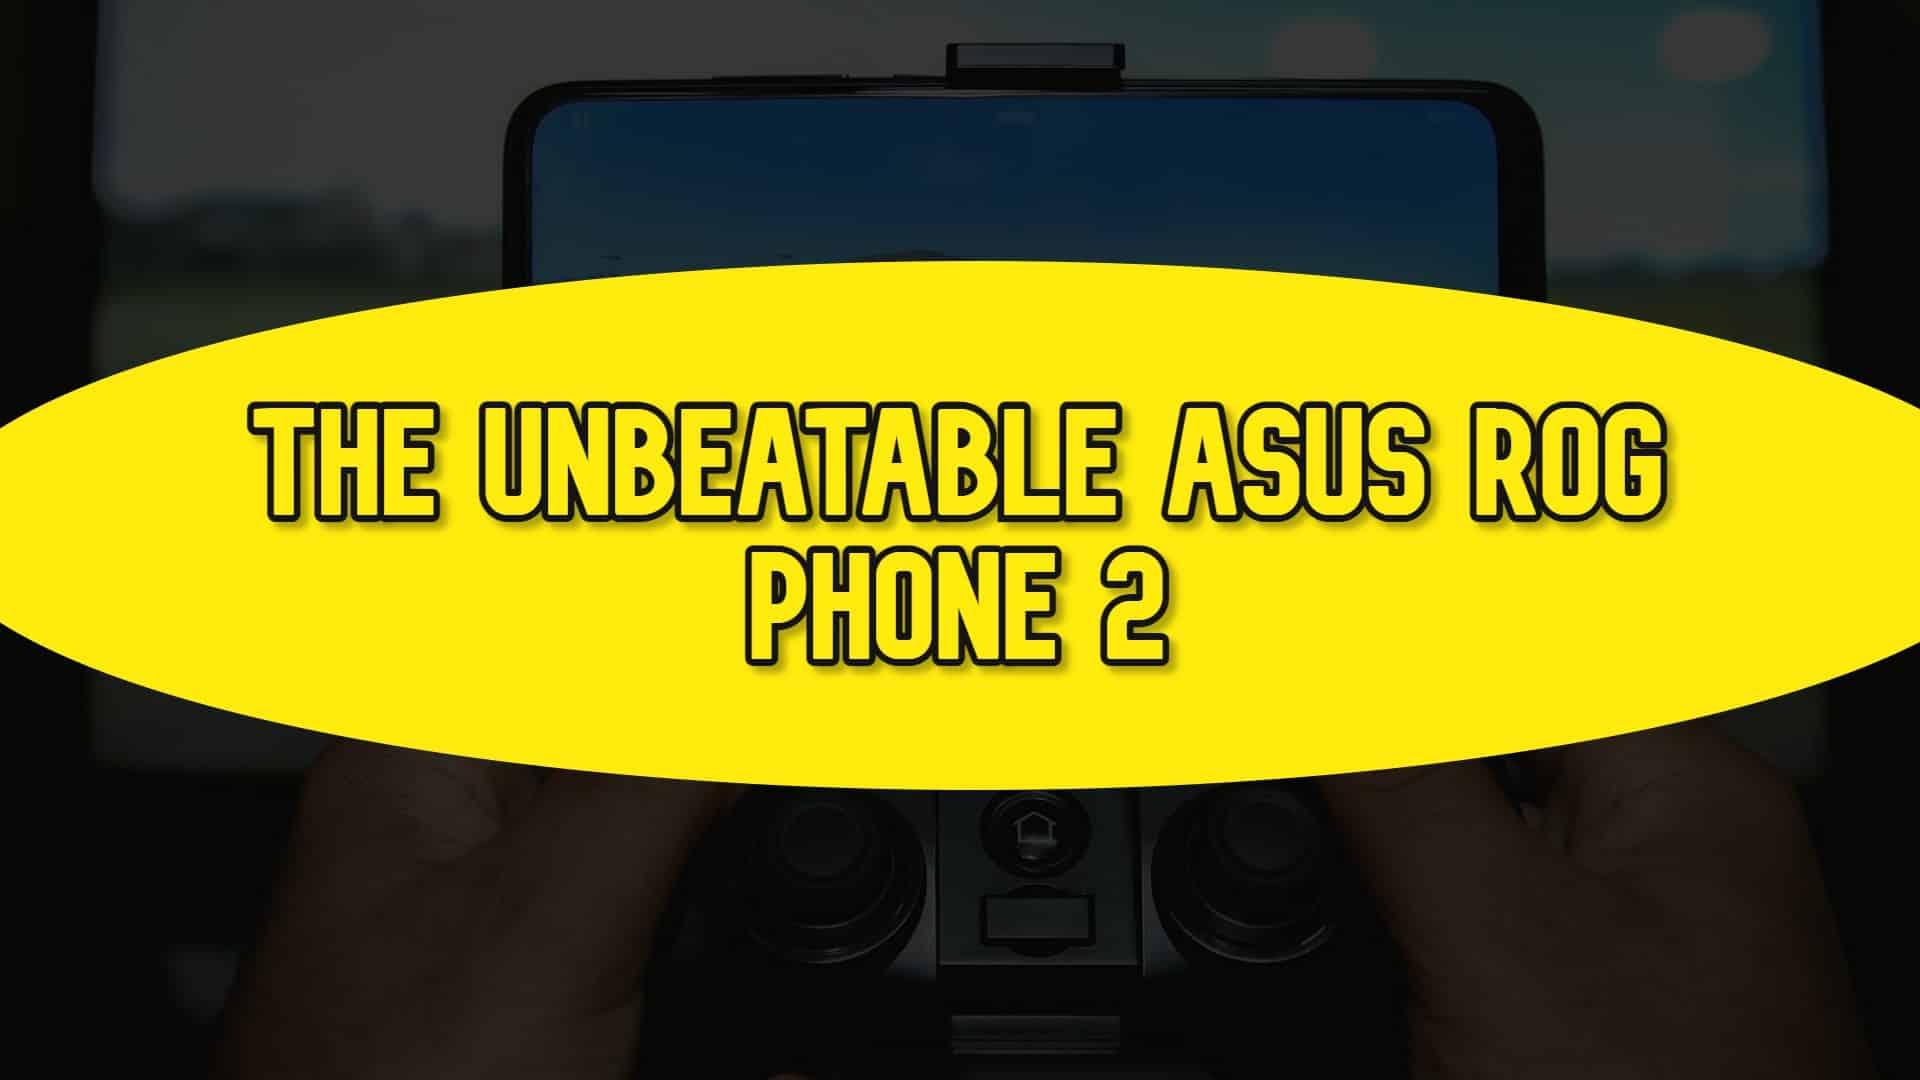 The Unbeatable Asus ROG Phone 2